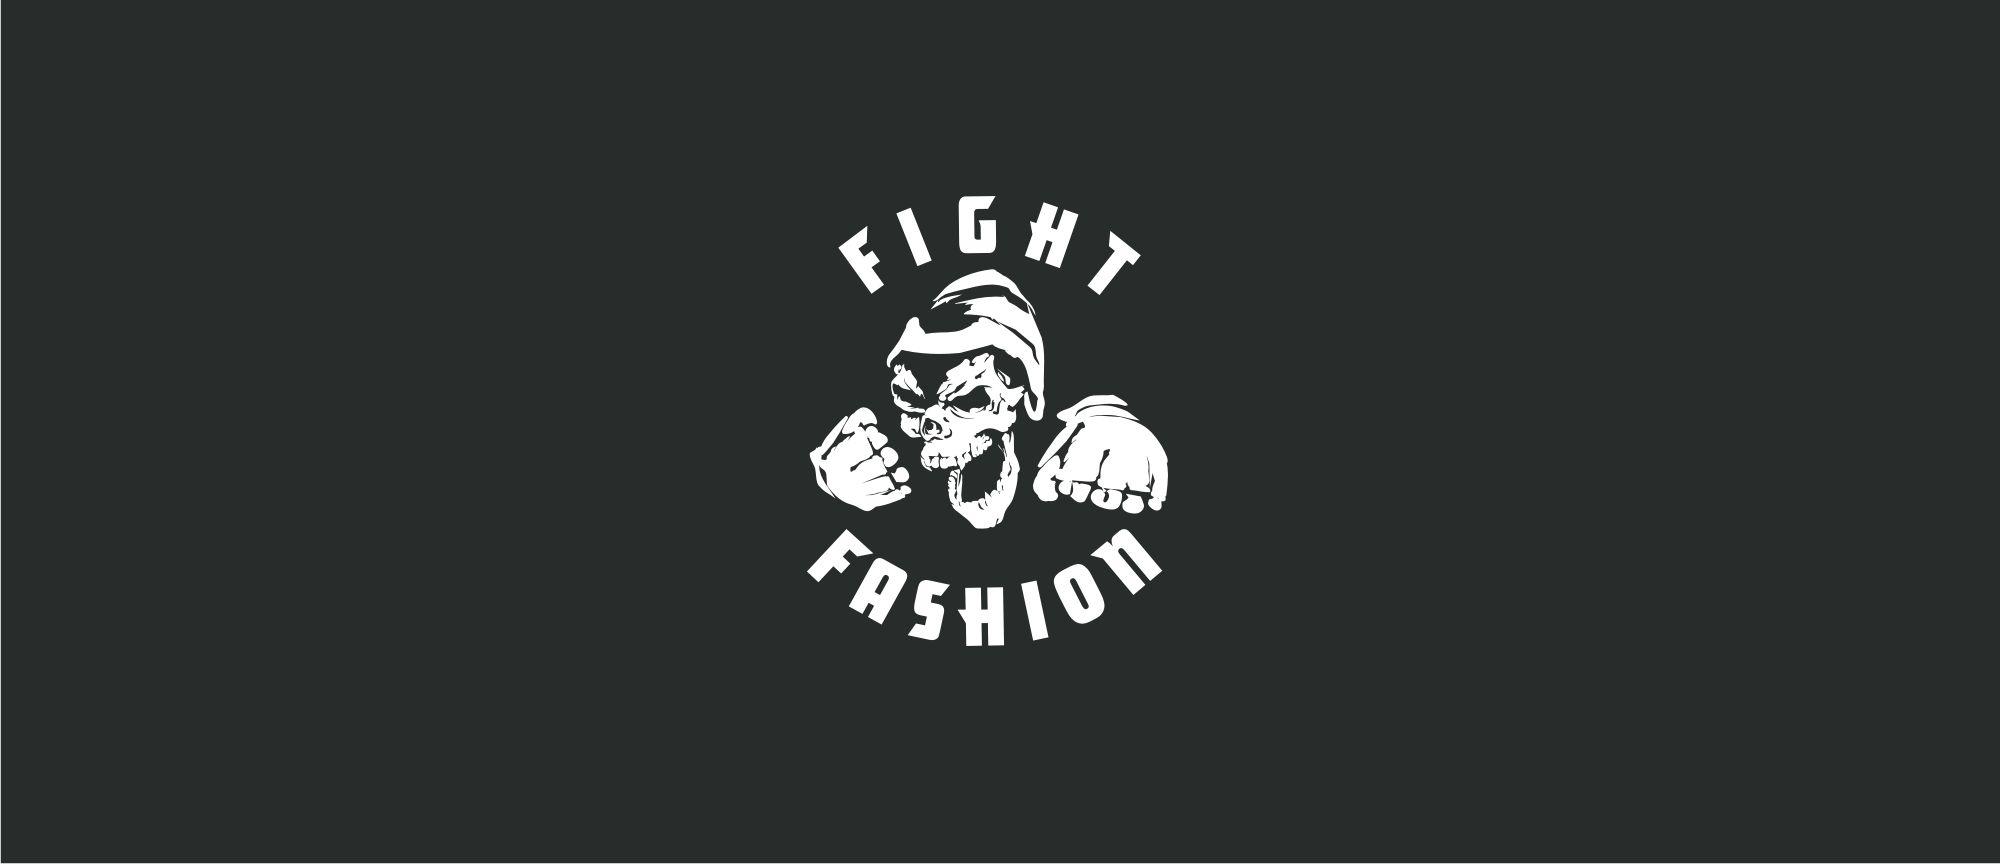 Логотип для Fight Fashion - дизайнер 89638480888